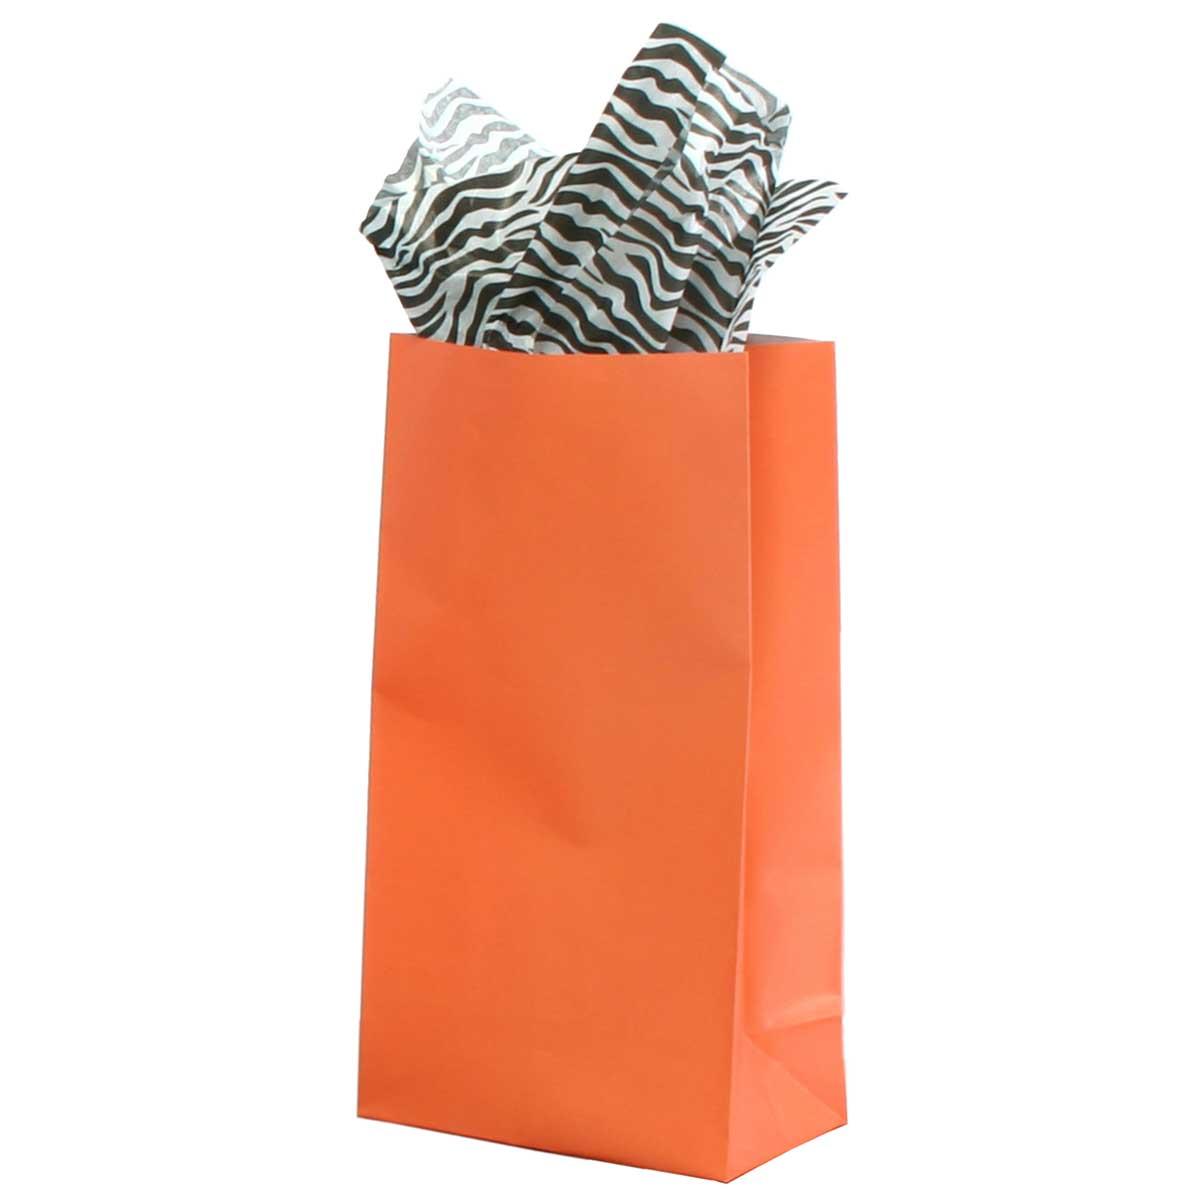 LARGE PAPER BAG CORAL *30sp